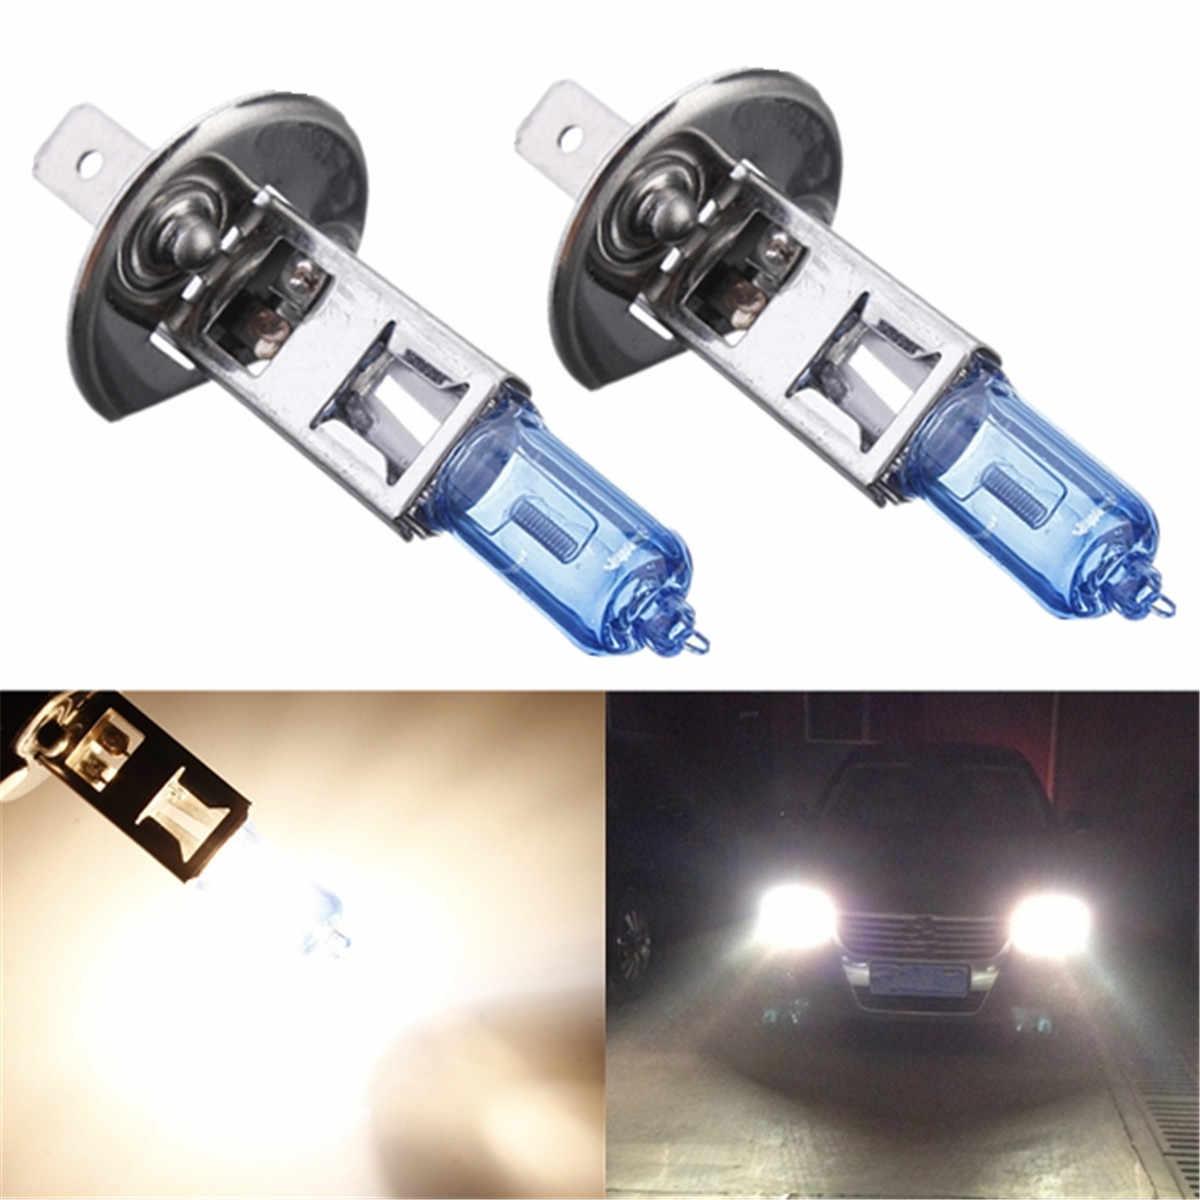 1/2/4/10pcs H1 Super Bright White Fog Halogen Bulbs 100W Car Headlight Lamp Lights 12V car styling car light source parking auto